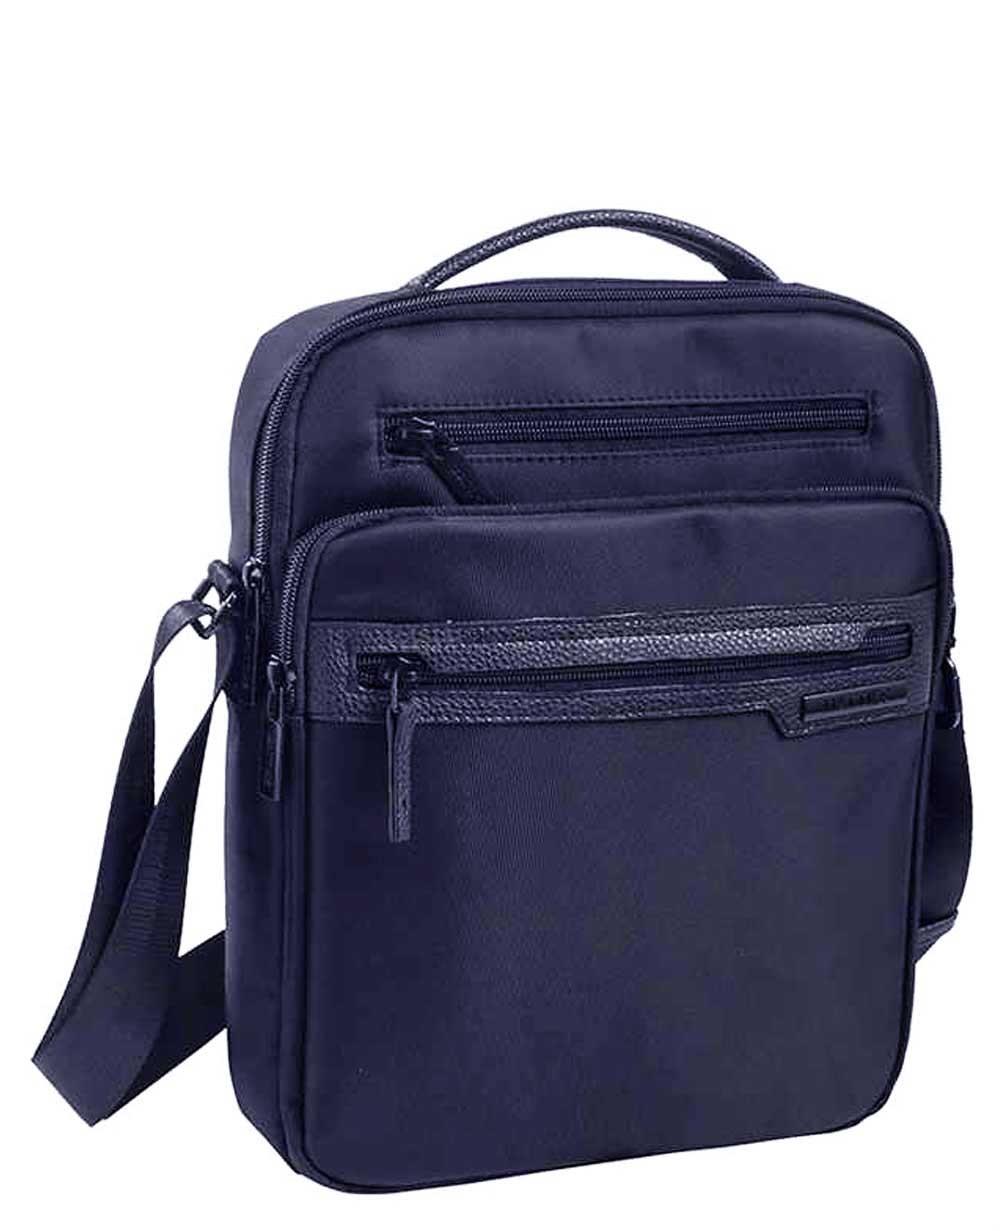 "Matties Bags 10.2"" Bandolera Lona Azul (Foto )"